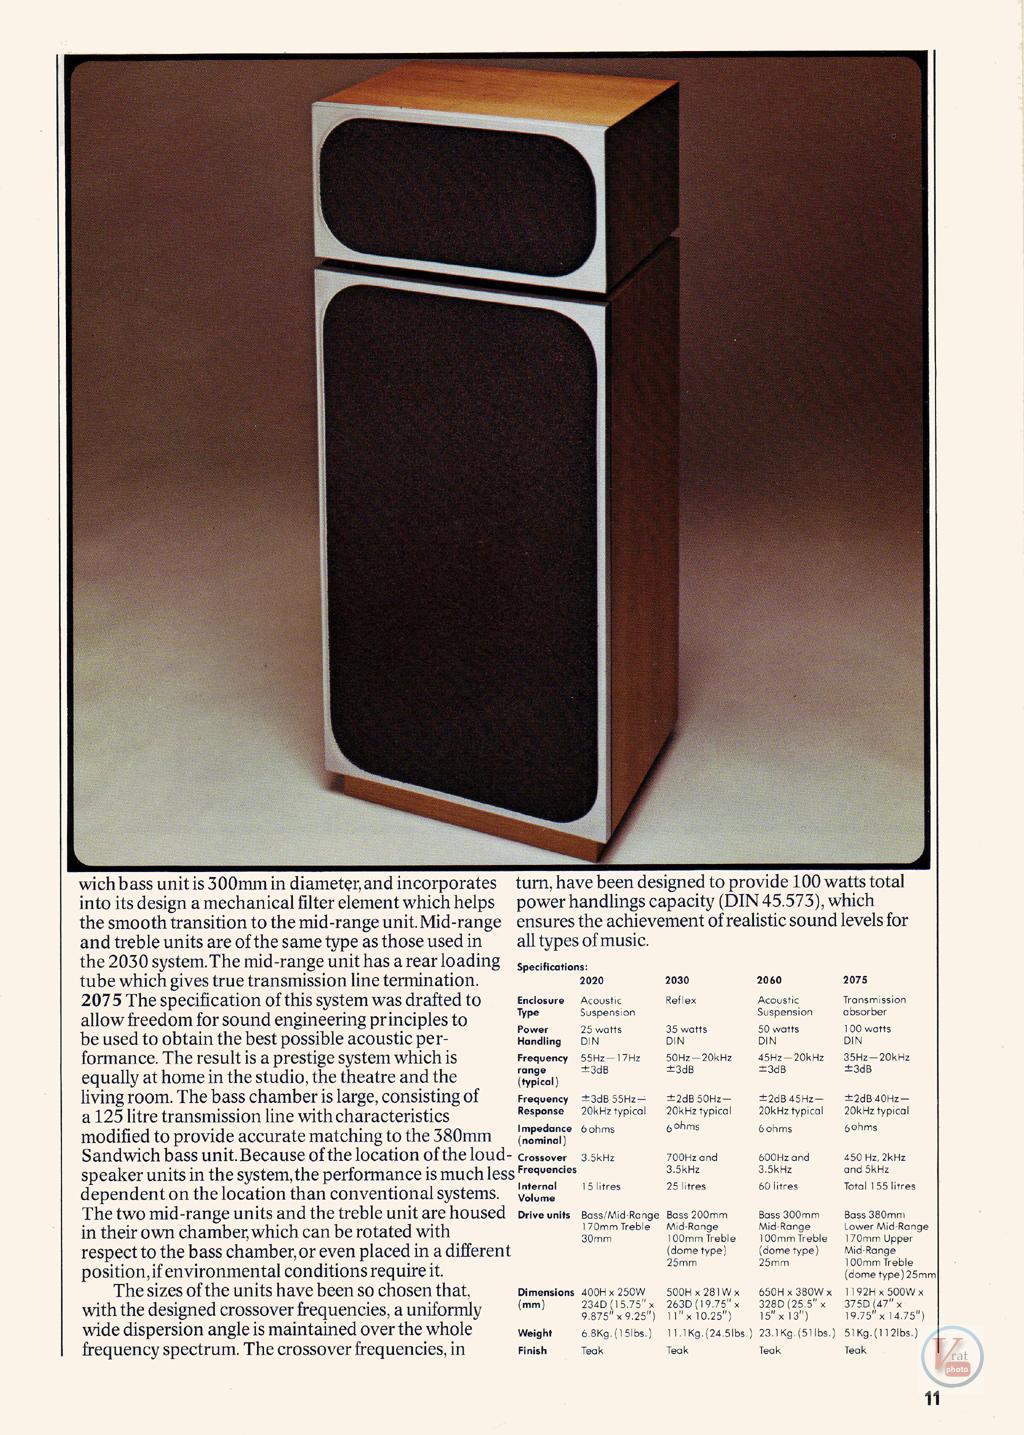 Leak Speakers 3